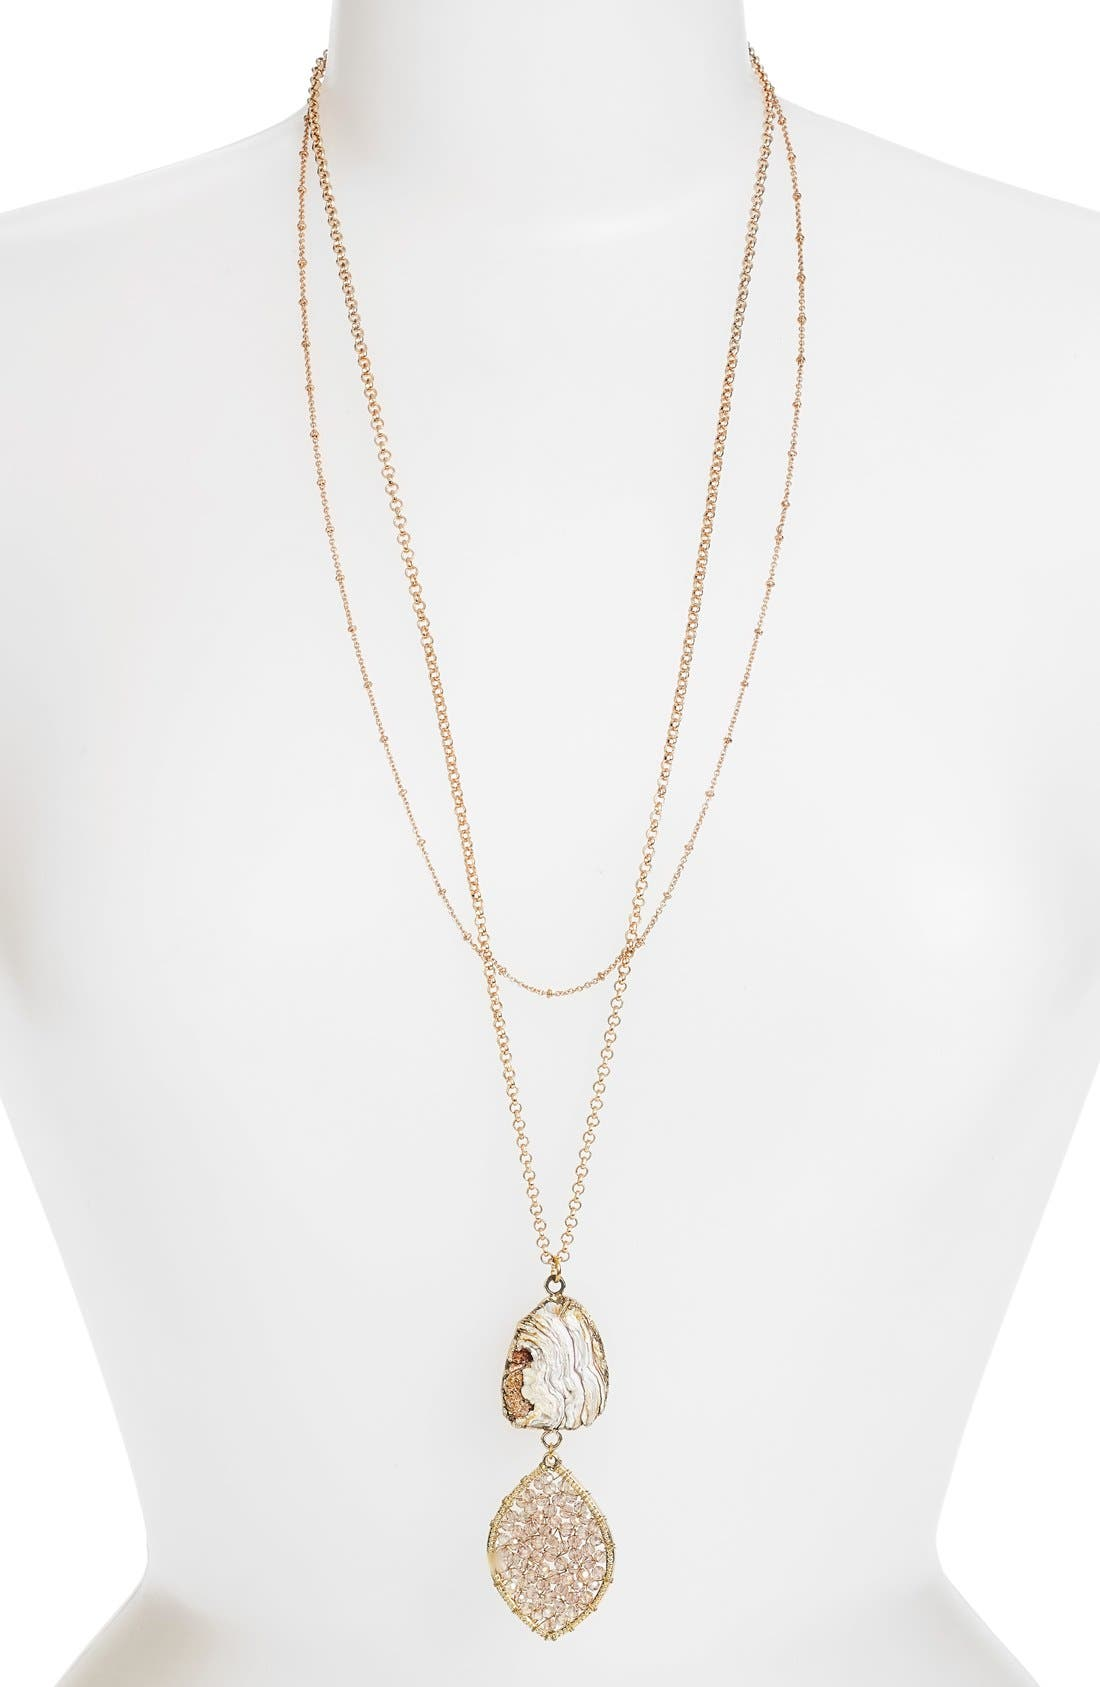 Panacea Stone & Beaded Crystal Pendant Layered Necklace